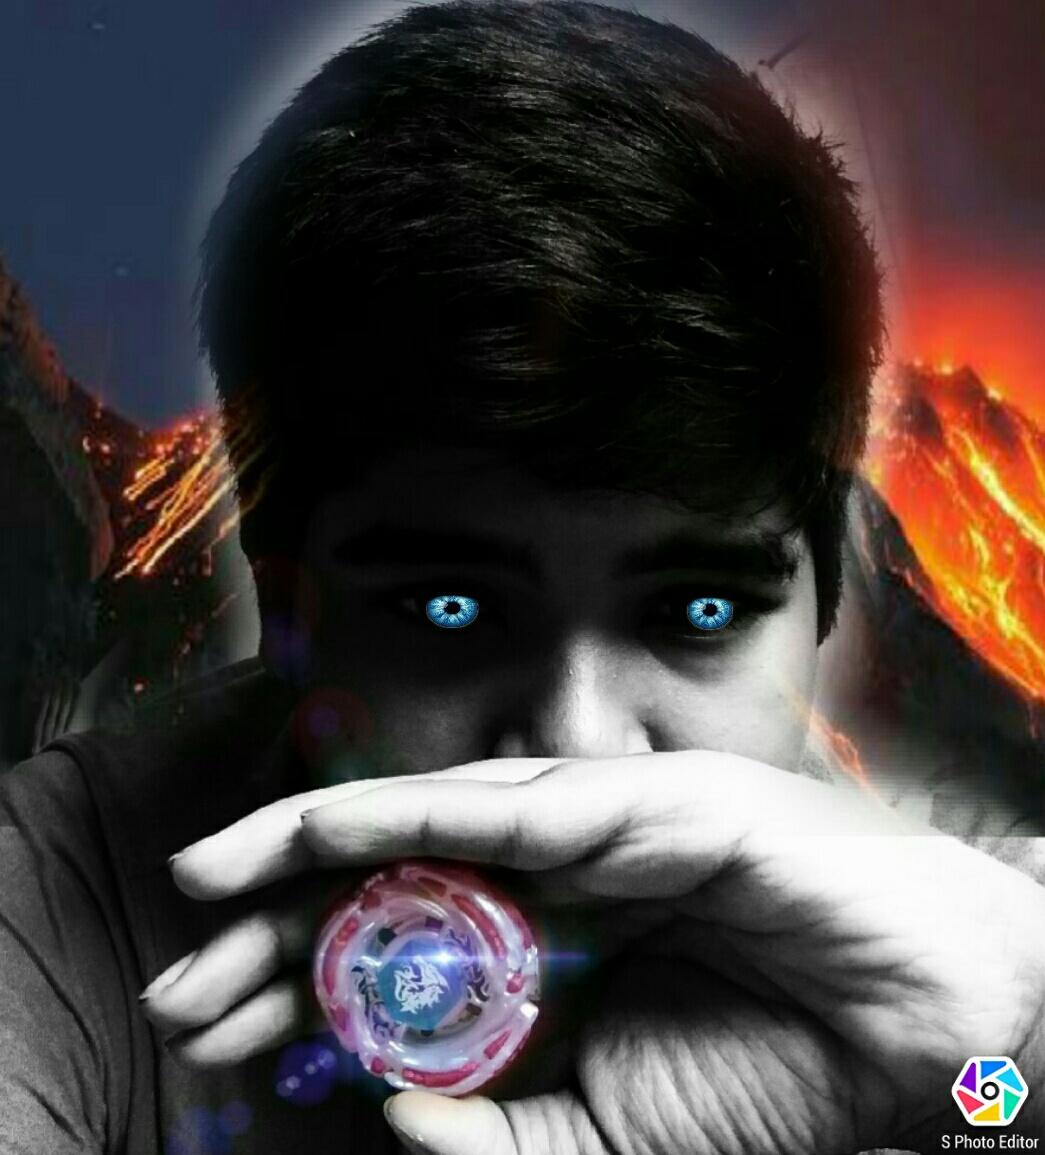 Ashmit Mohanty's avatar